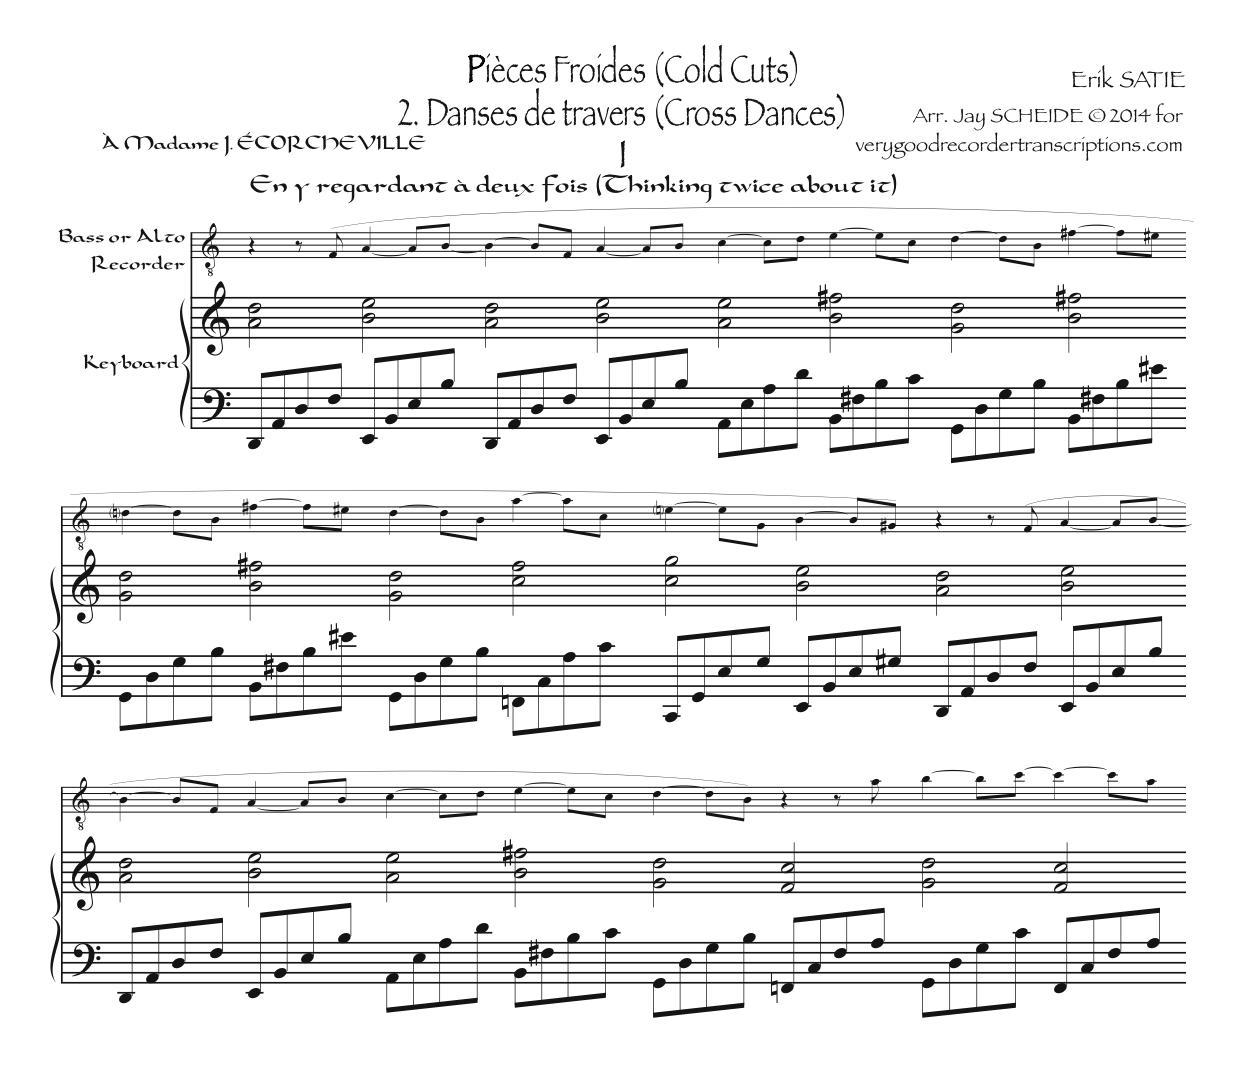 *Pièces froides*, Part 2—Danses de travers, arr. for bass or alto recorder and piano